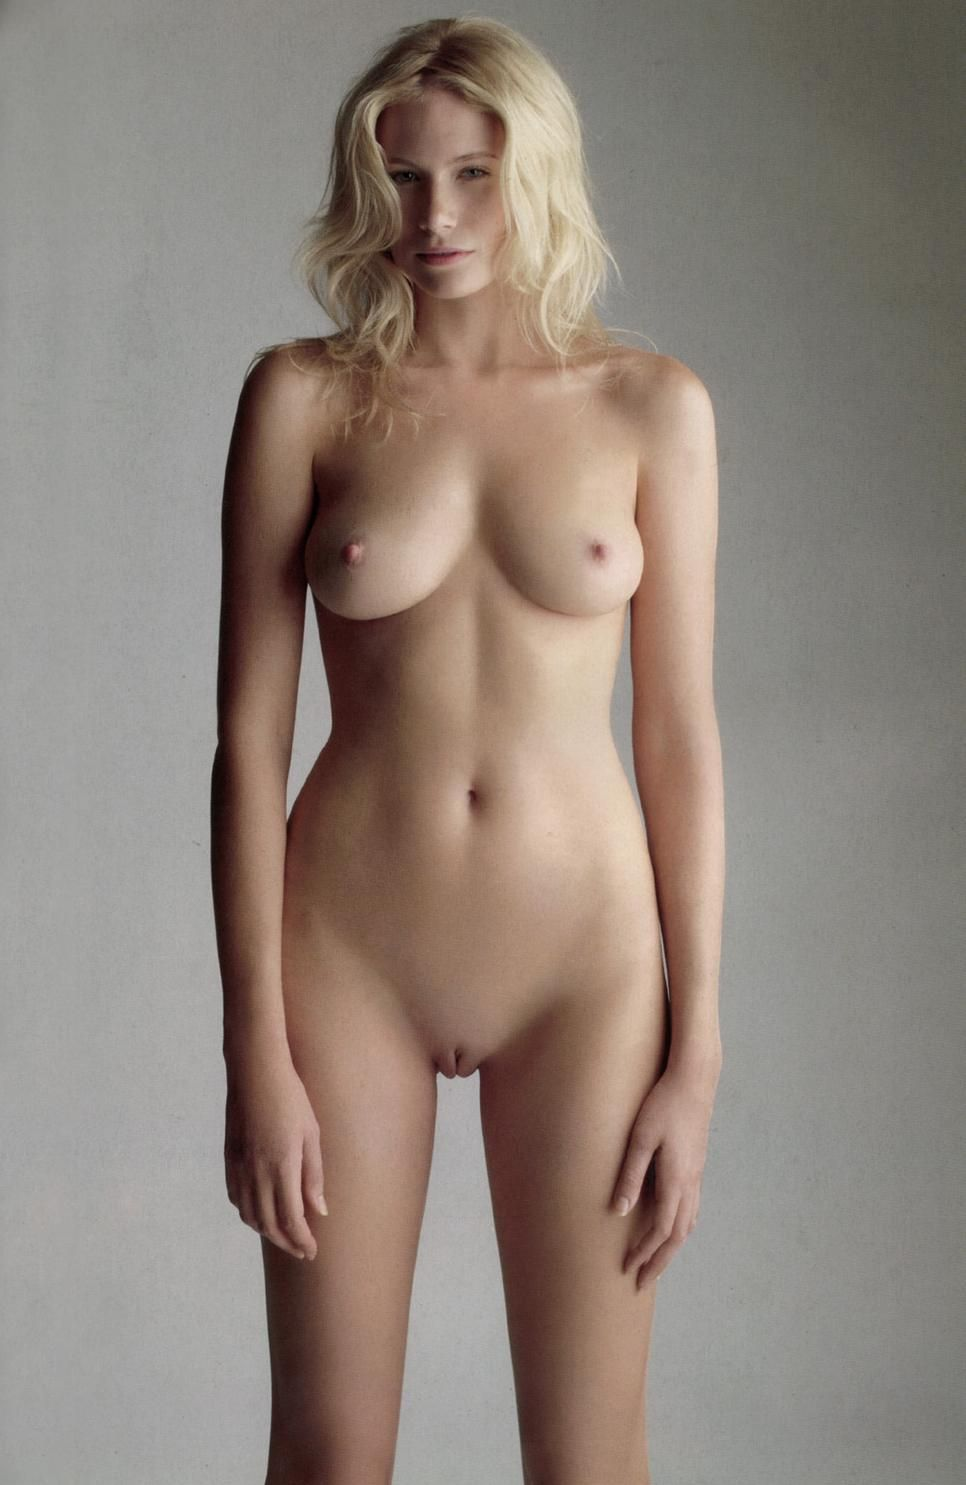 Milk fetish porn pics